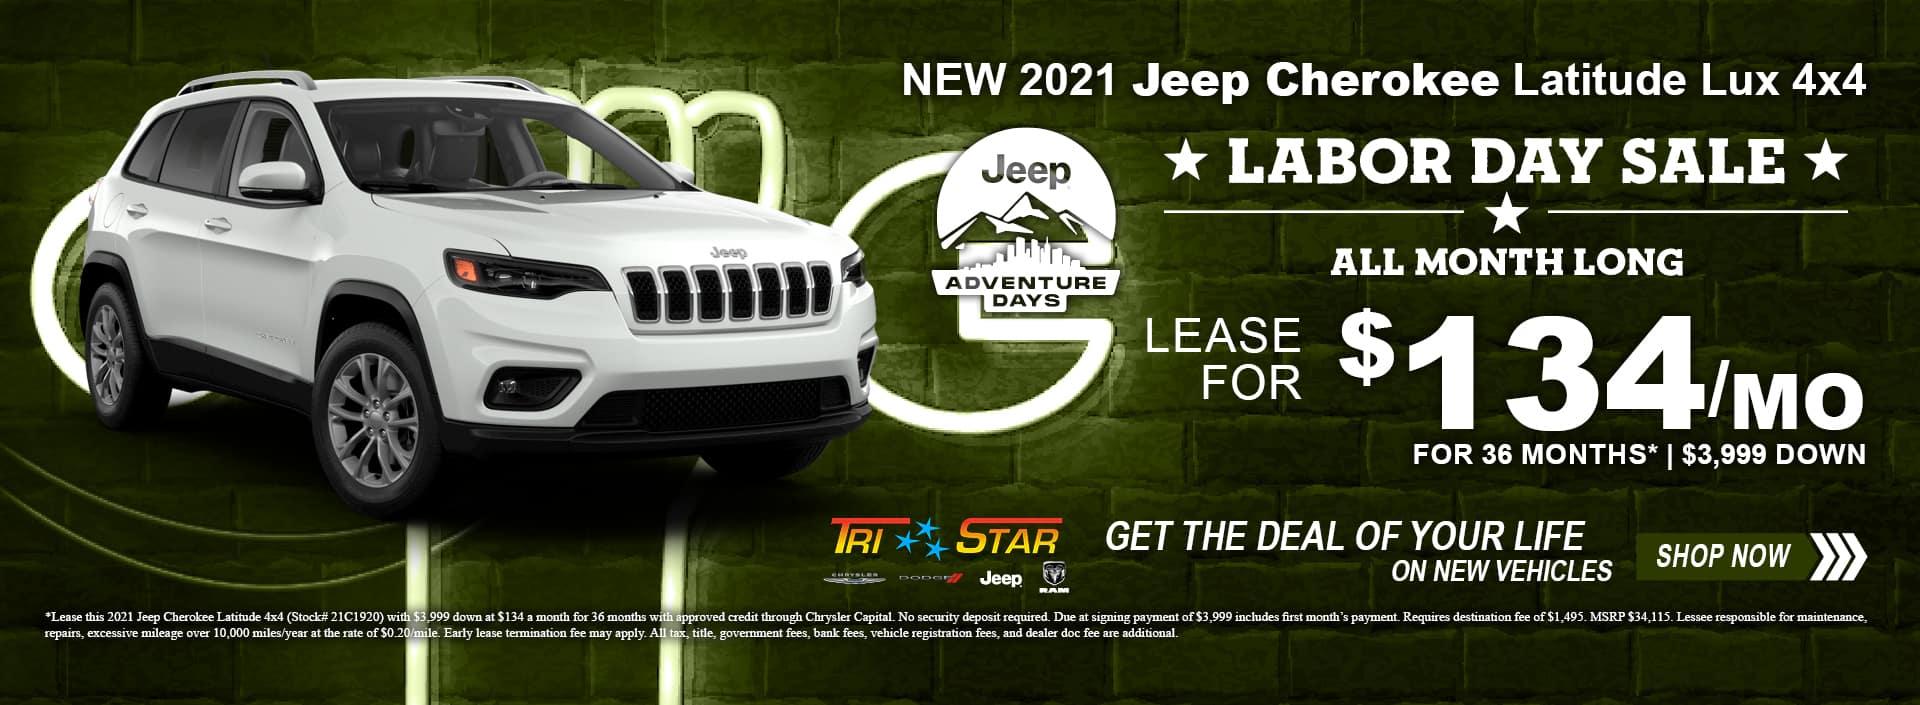 Jeep Cherokee Latitude Labor Day